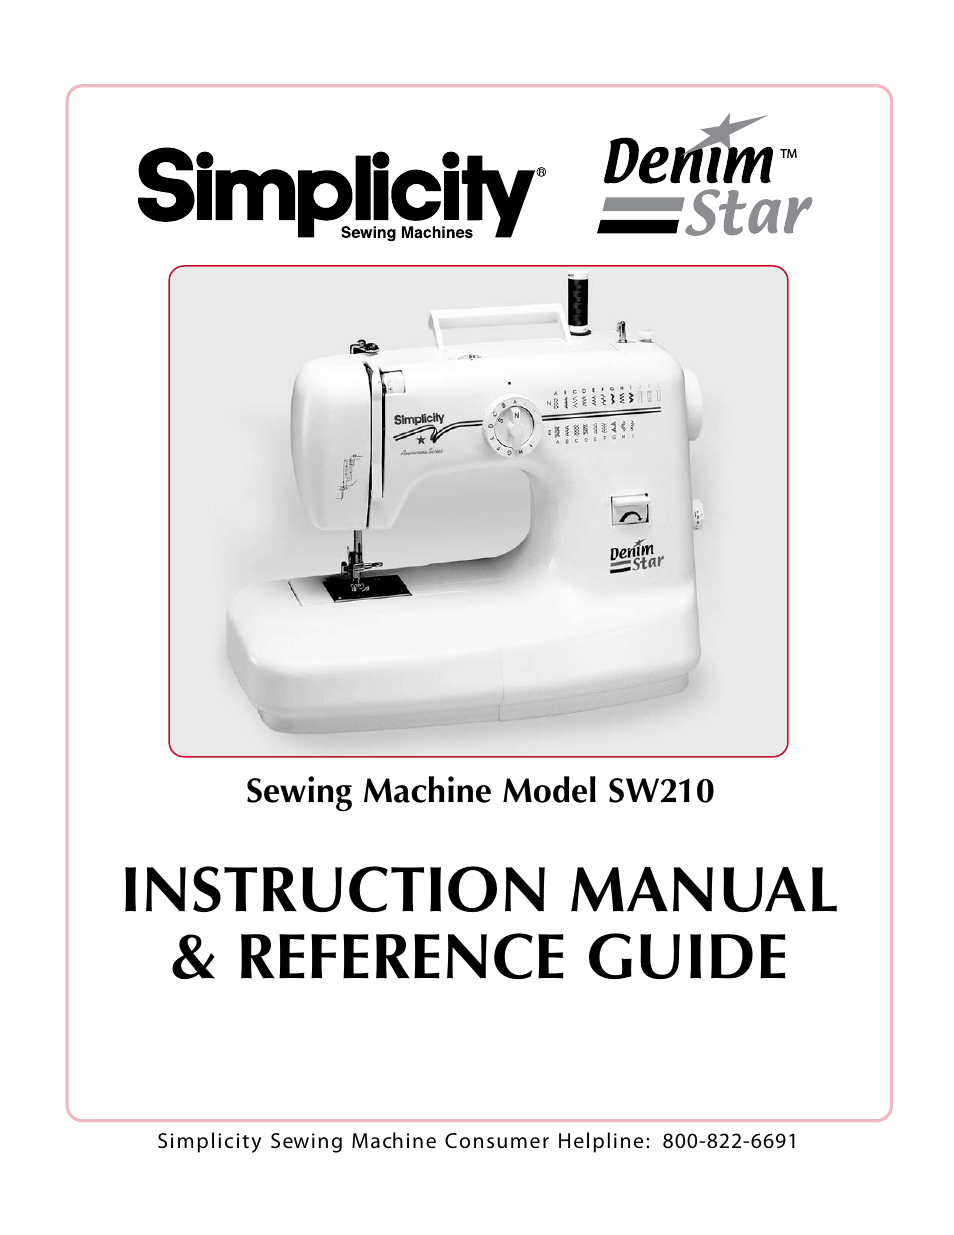 simplicity sw210 user manual 35 pages rh manualsdir com User Manual Template iPad Manual